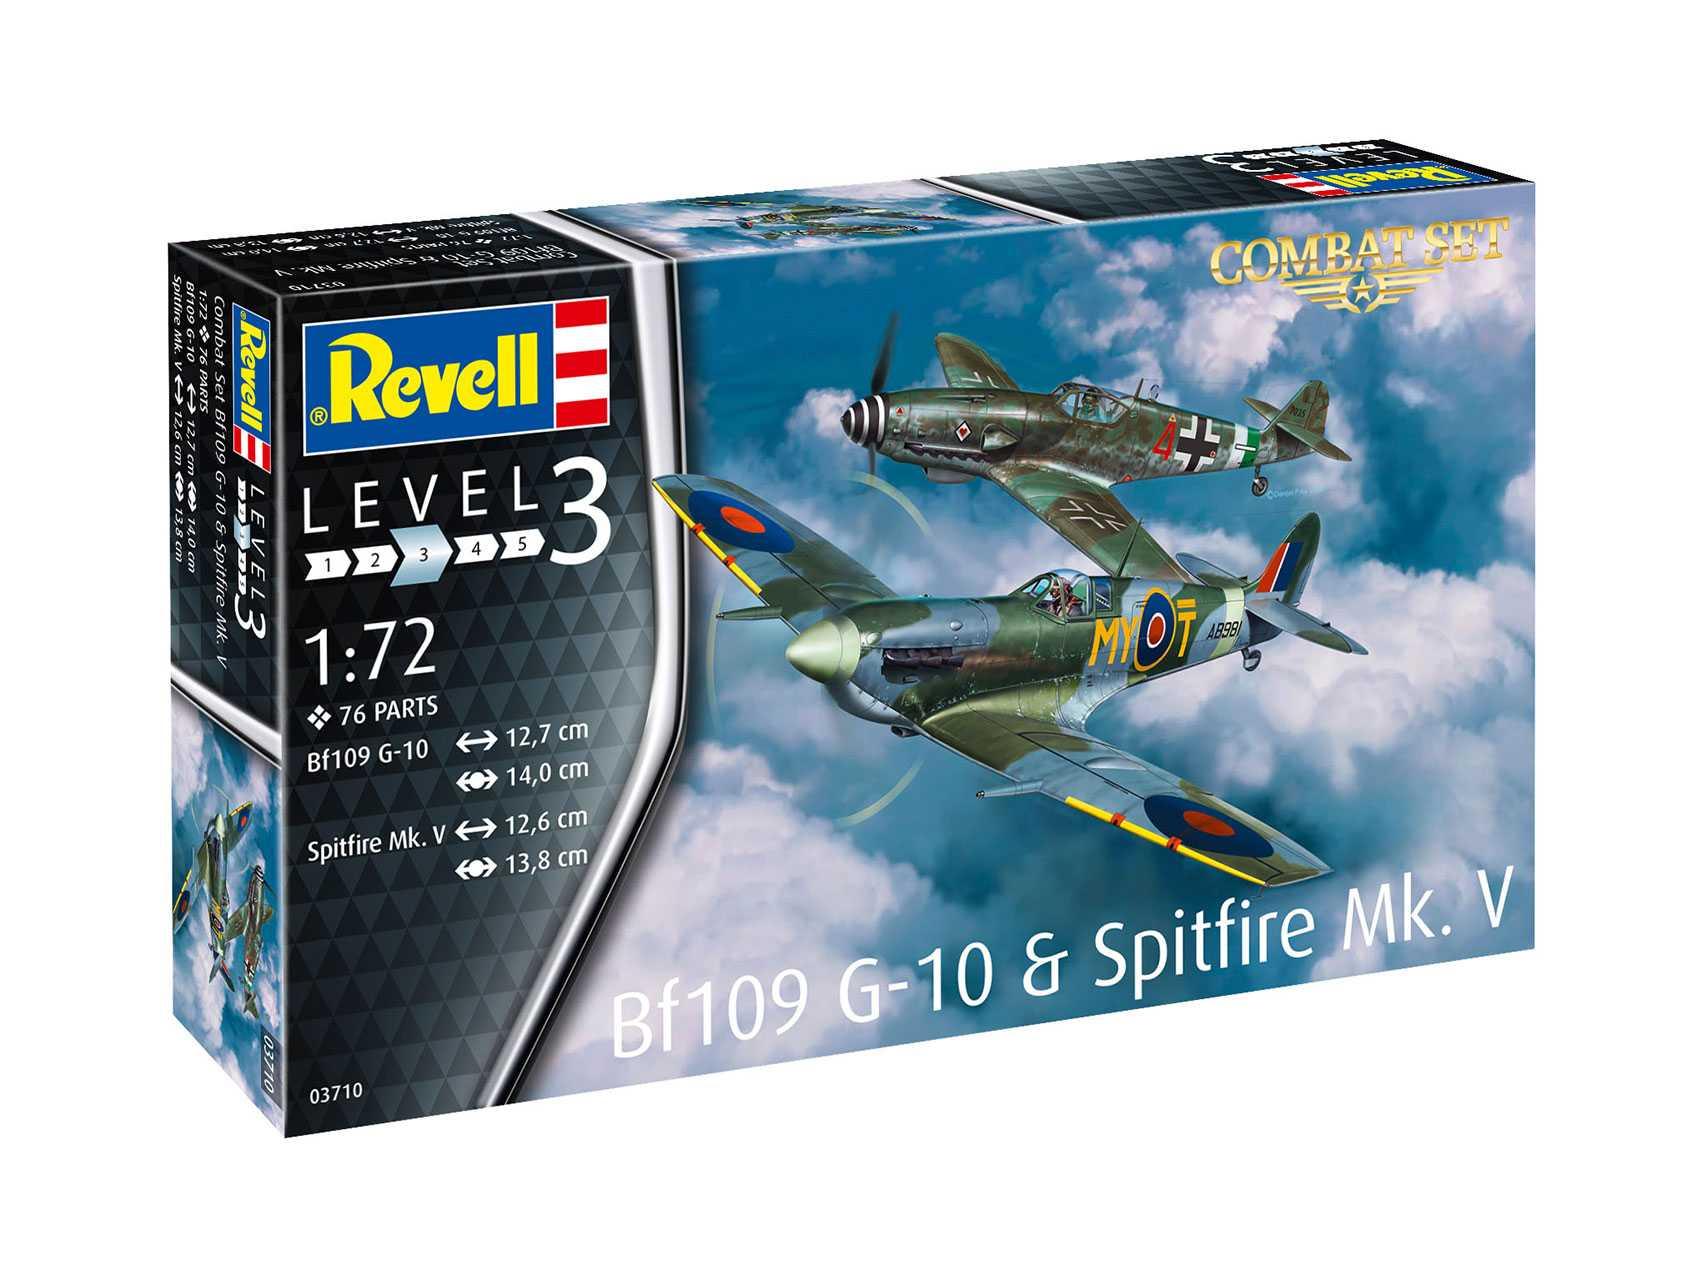 1:72 Messerschmitt Bf 109 G-10 & Supermarine Spitfire Mk.V (Model Set)